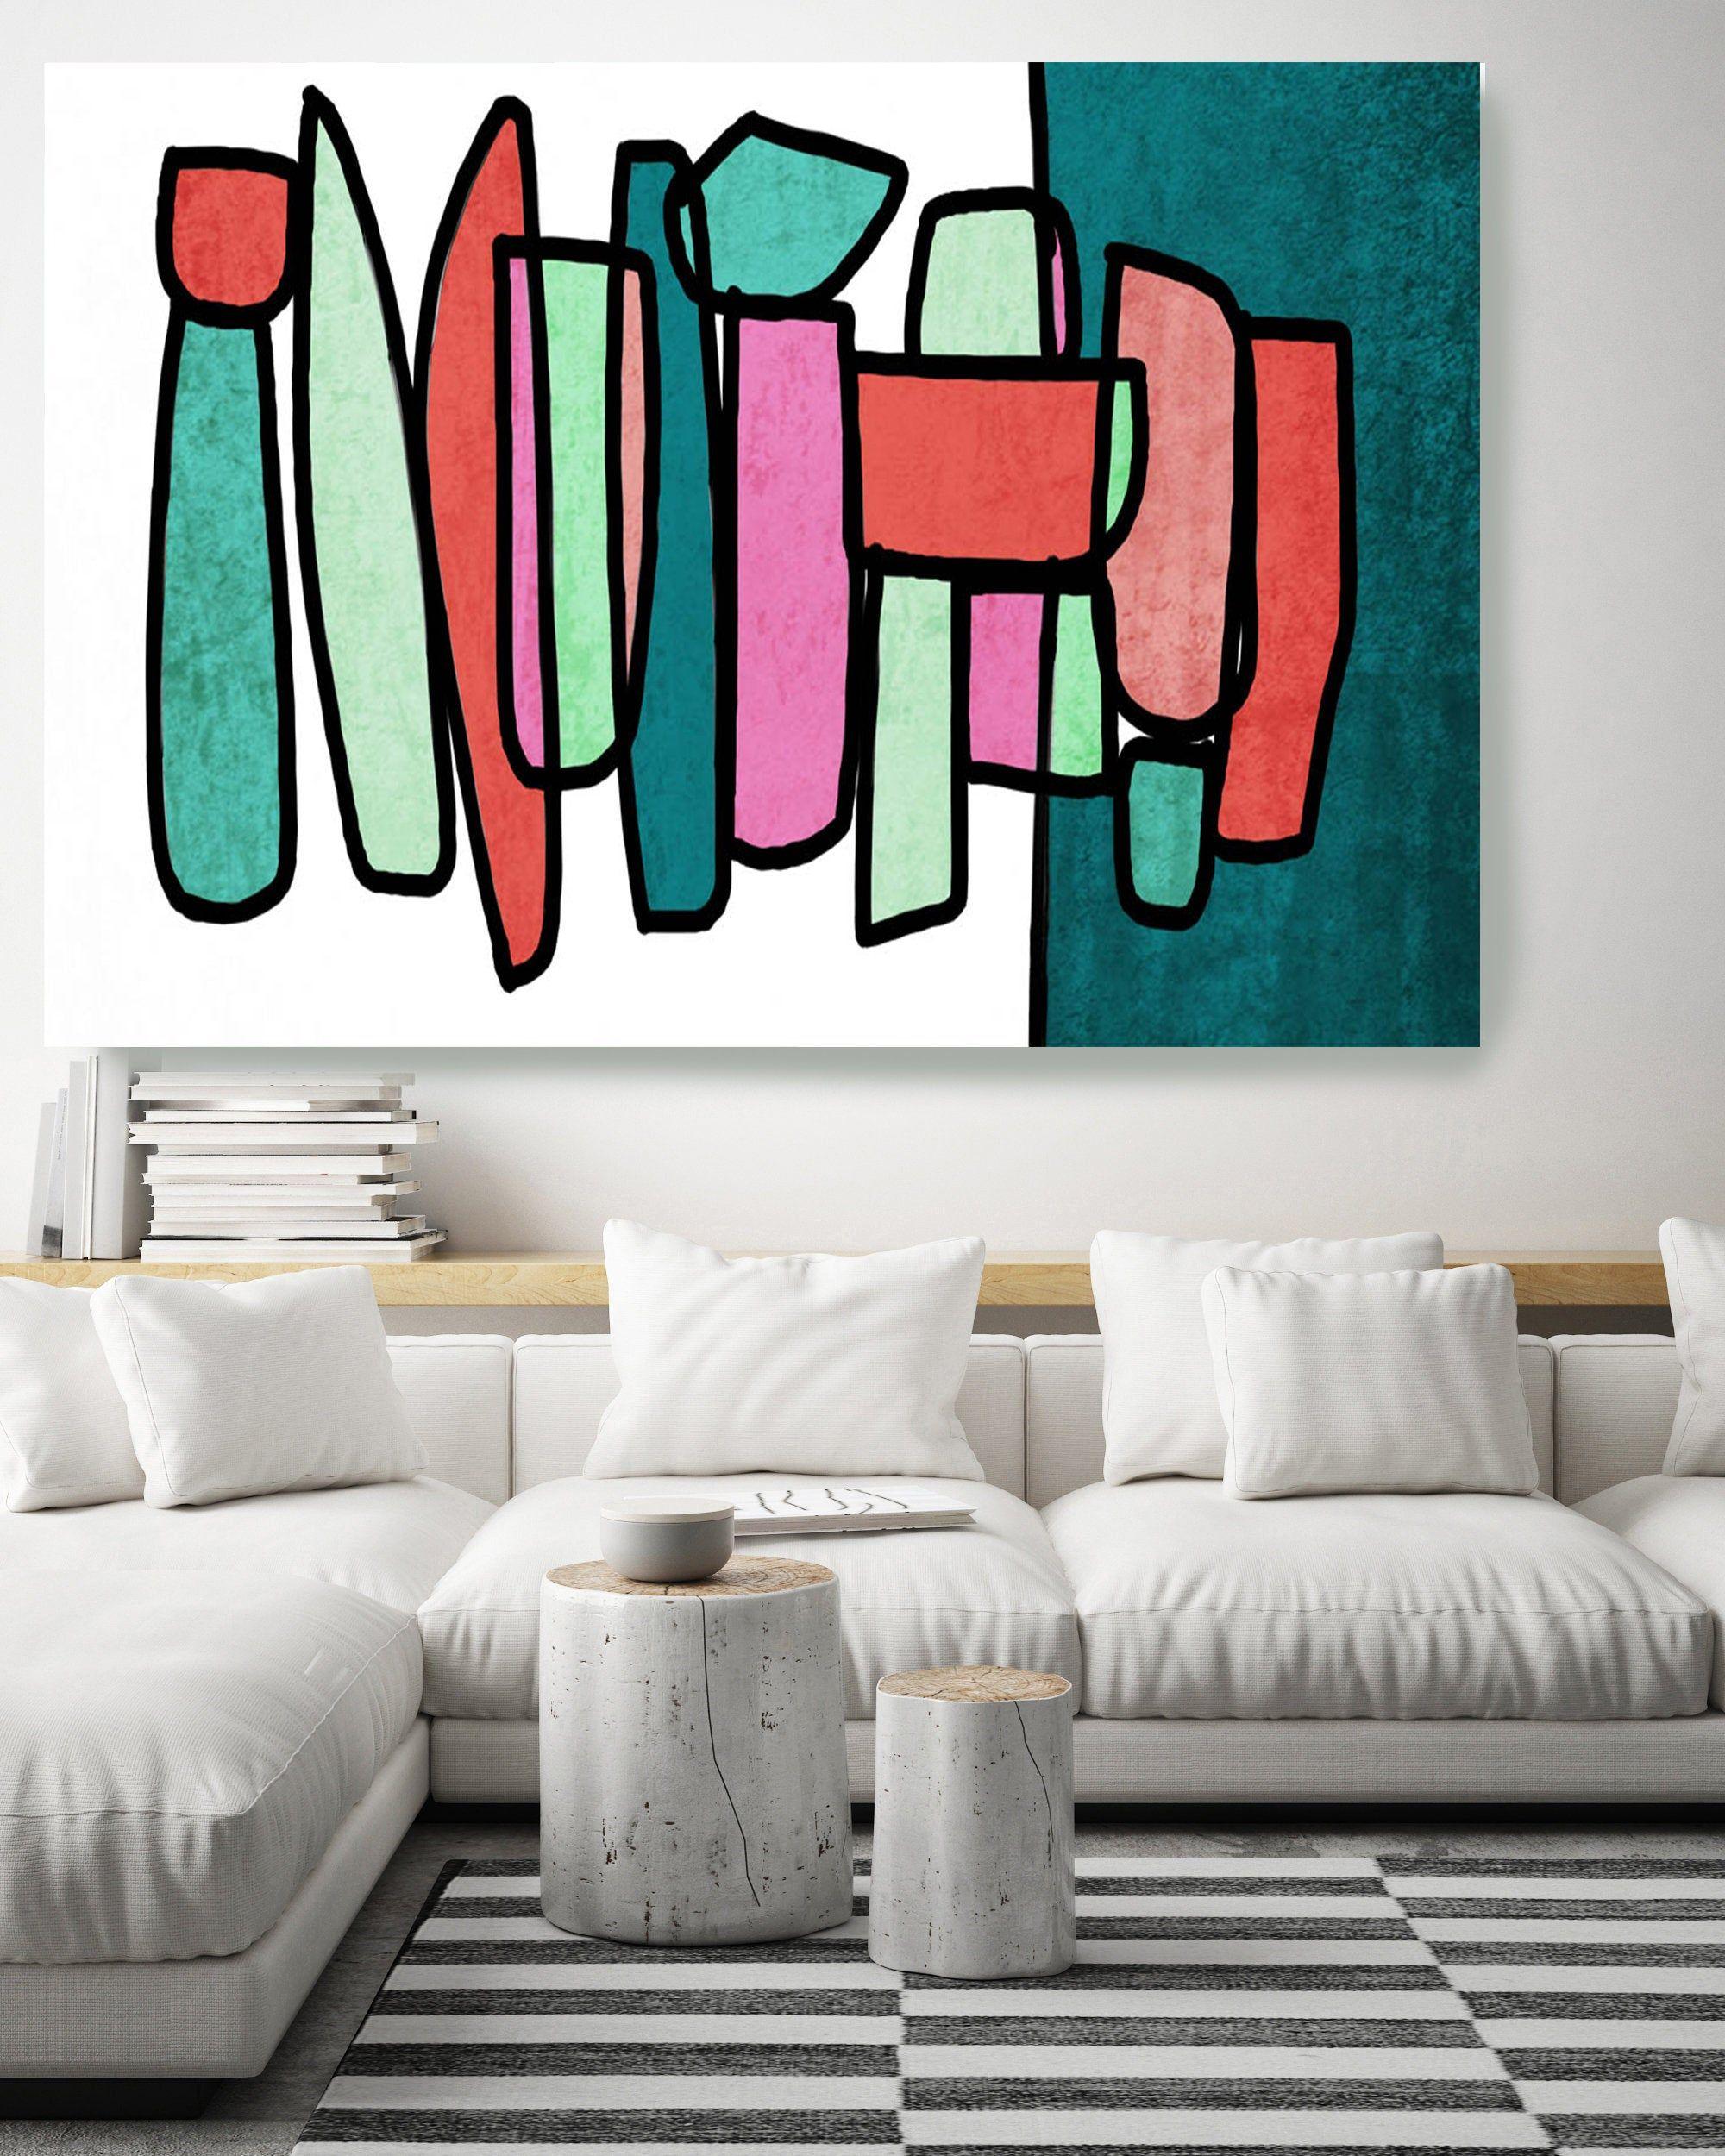 Mid Century Modern Colorful Art Canvas Print Midcentury Modern Abstract Art Midcentury Canvas Print Wall Art Retro Home Decor Brand In 2021 Canvas Art Prints Colorful Art Contemporary Art Canvas